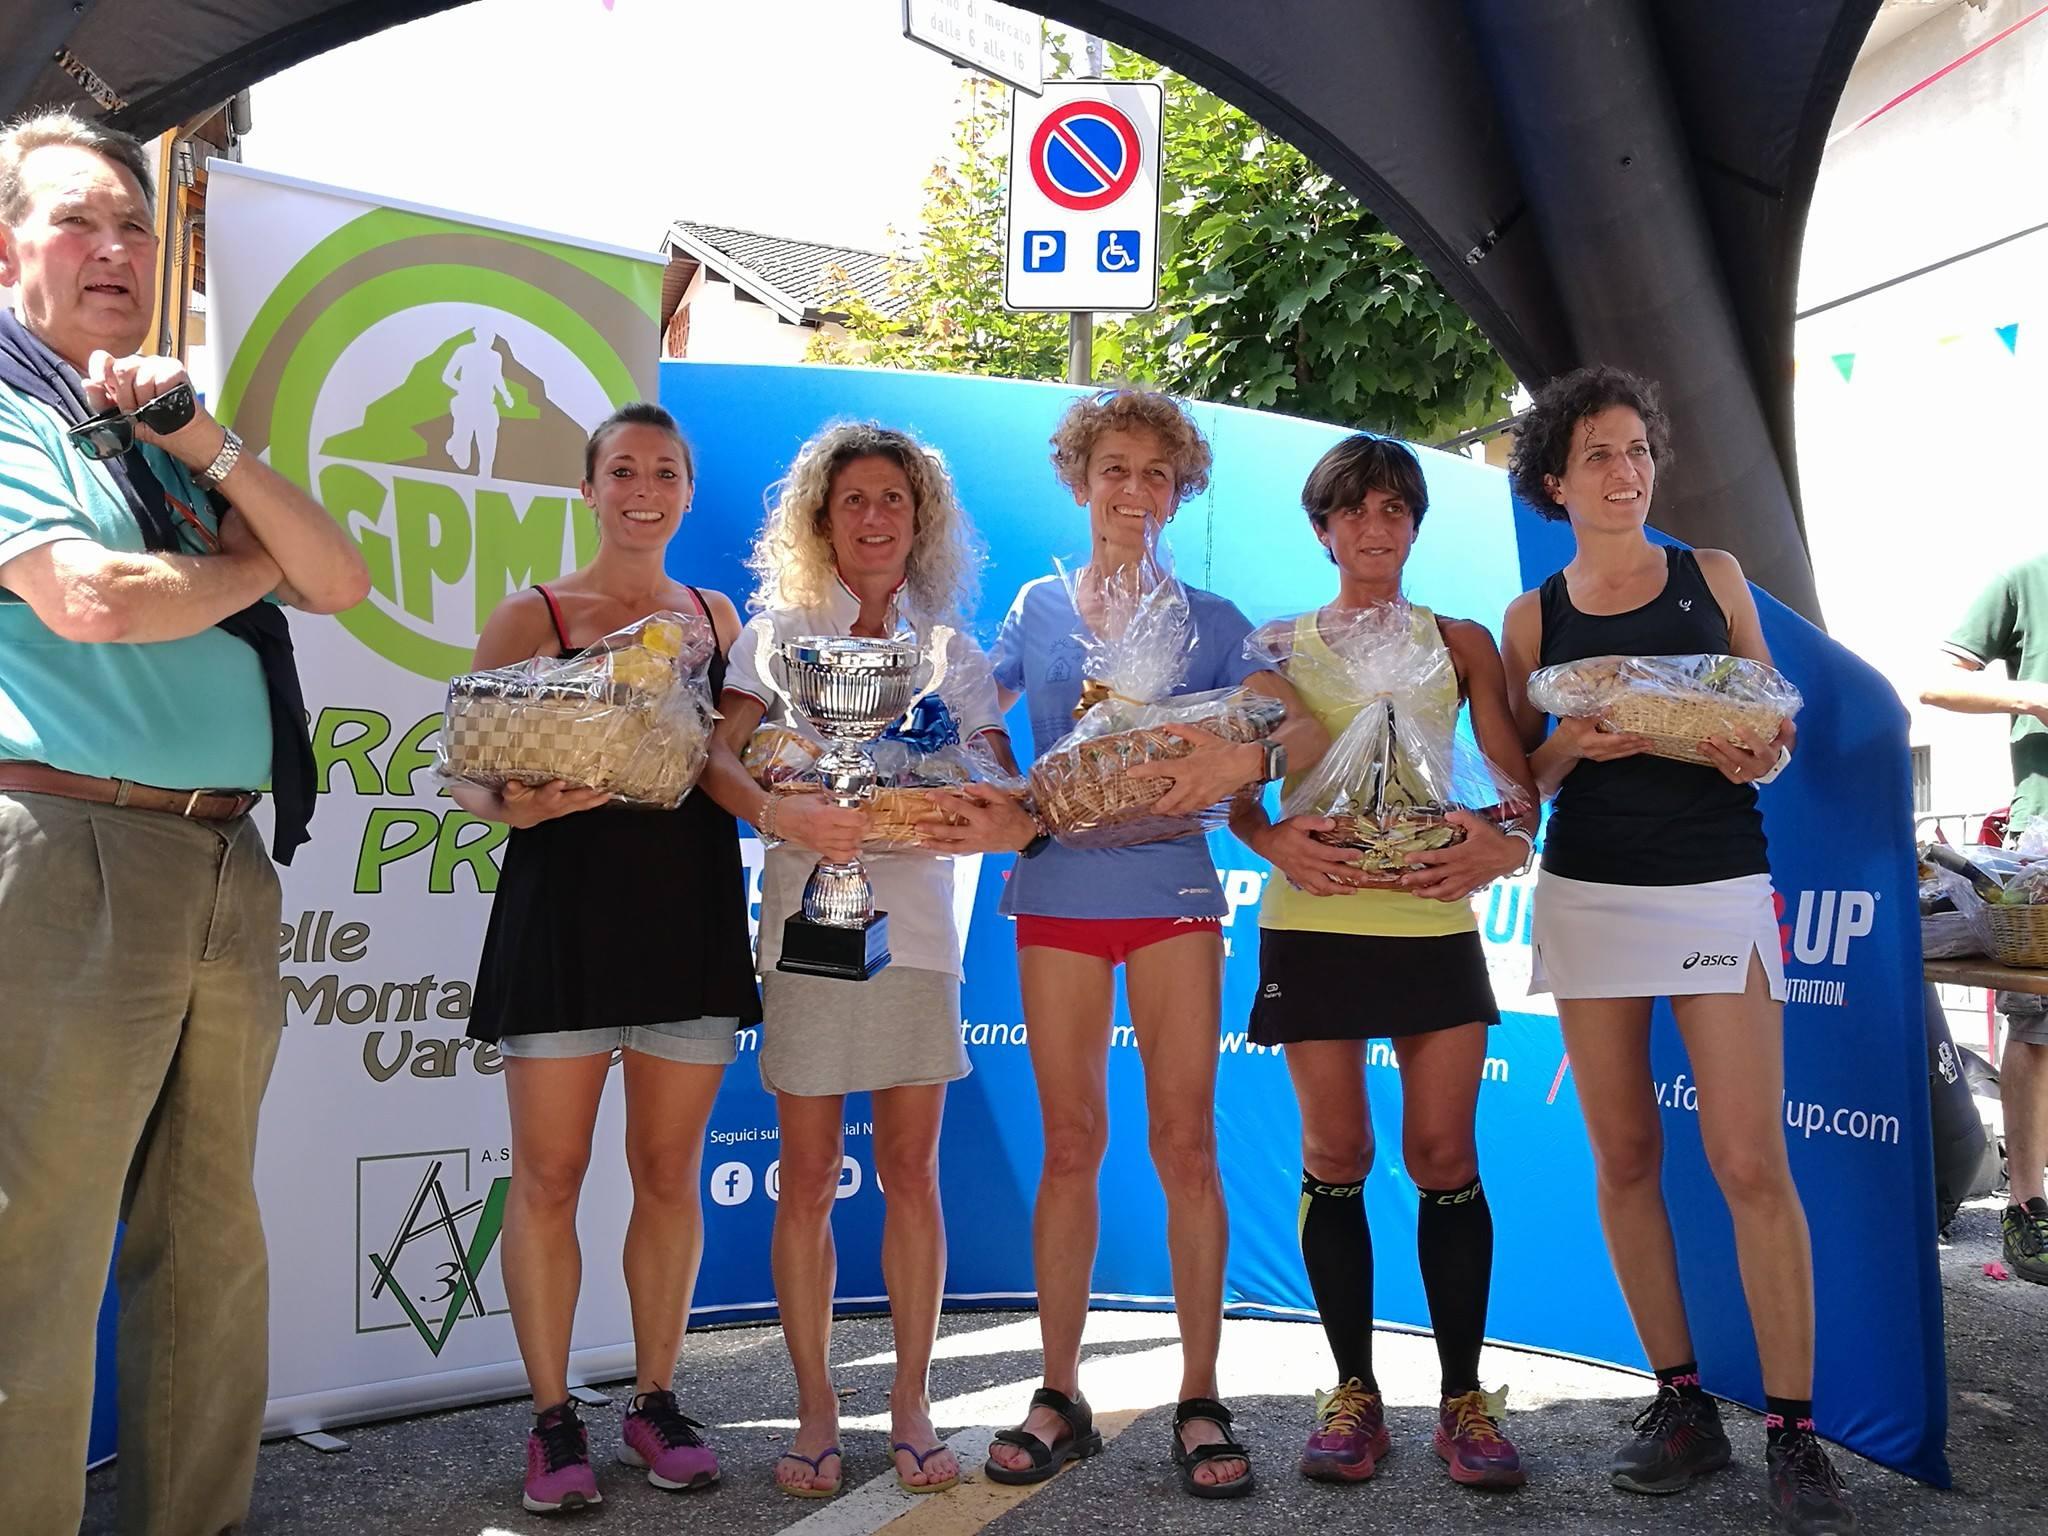 podio femminile i tre campanili